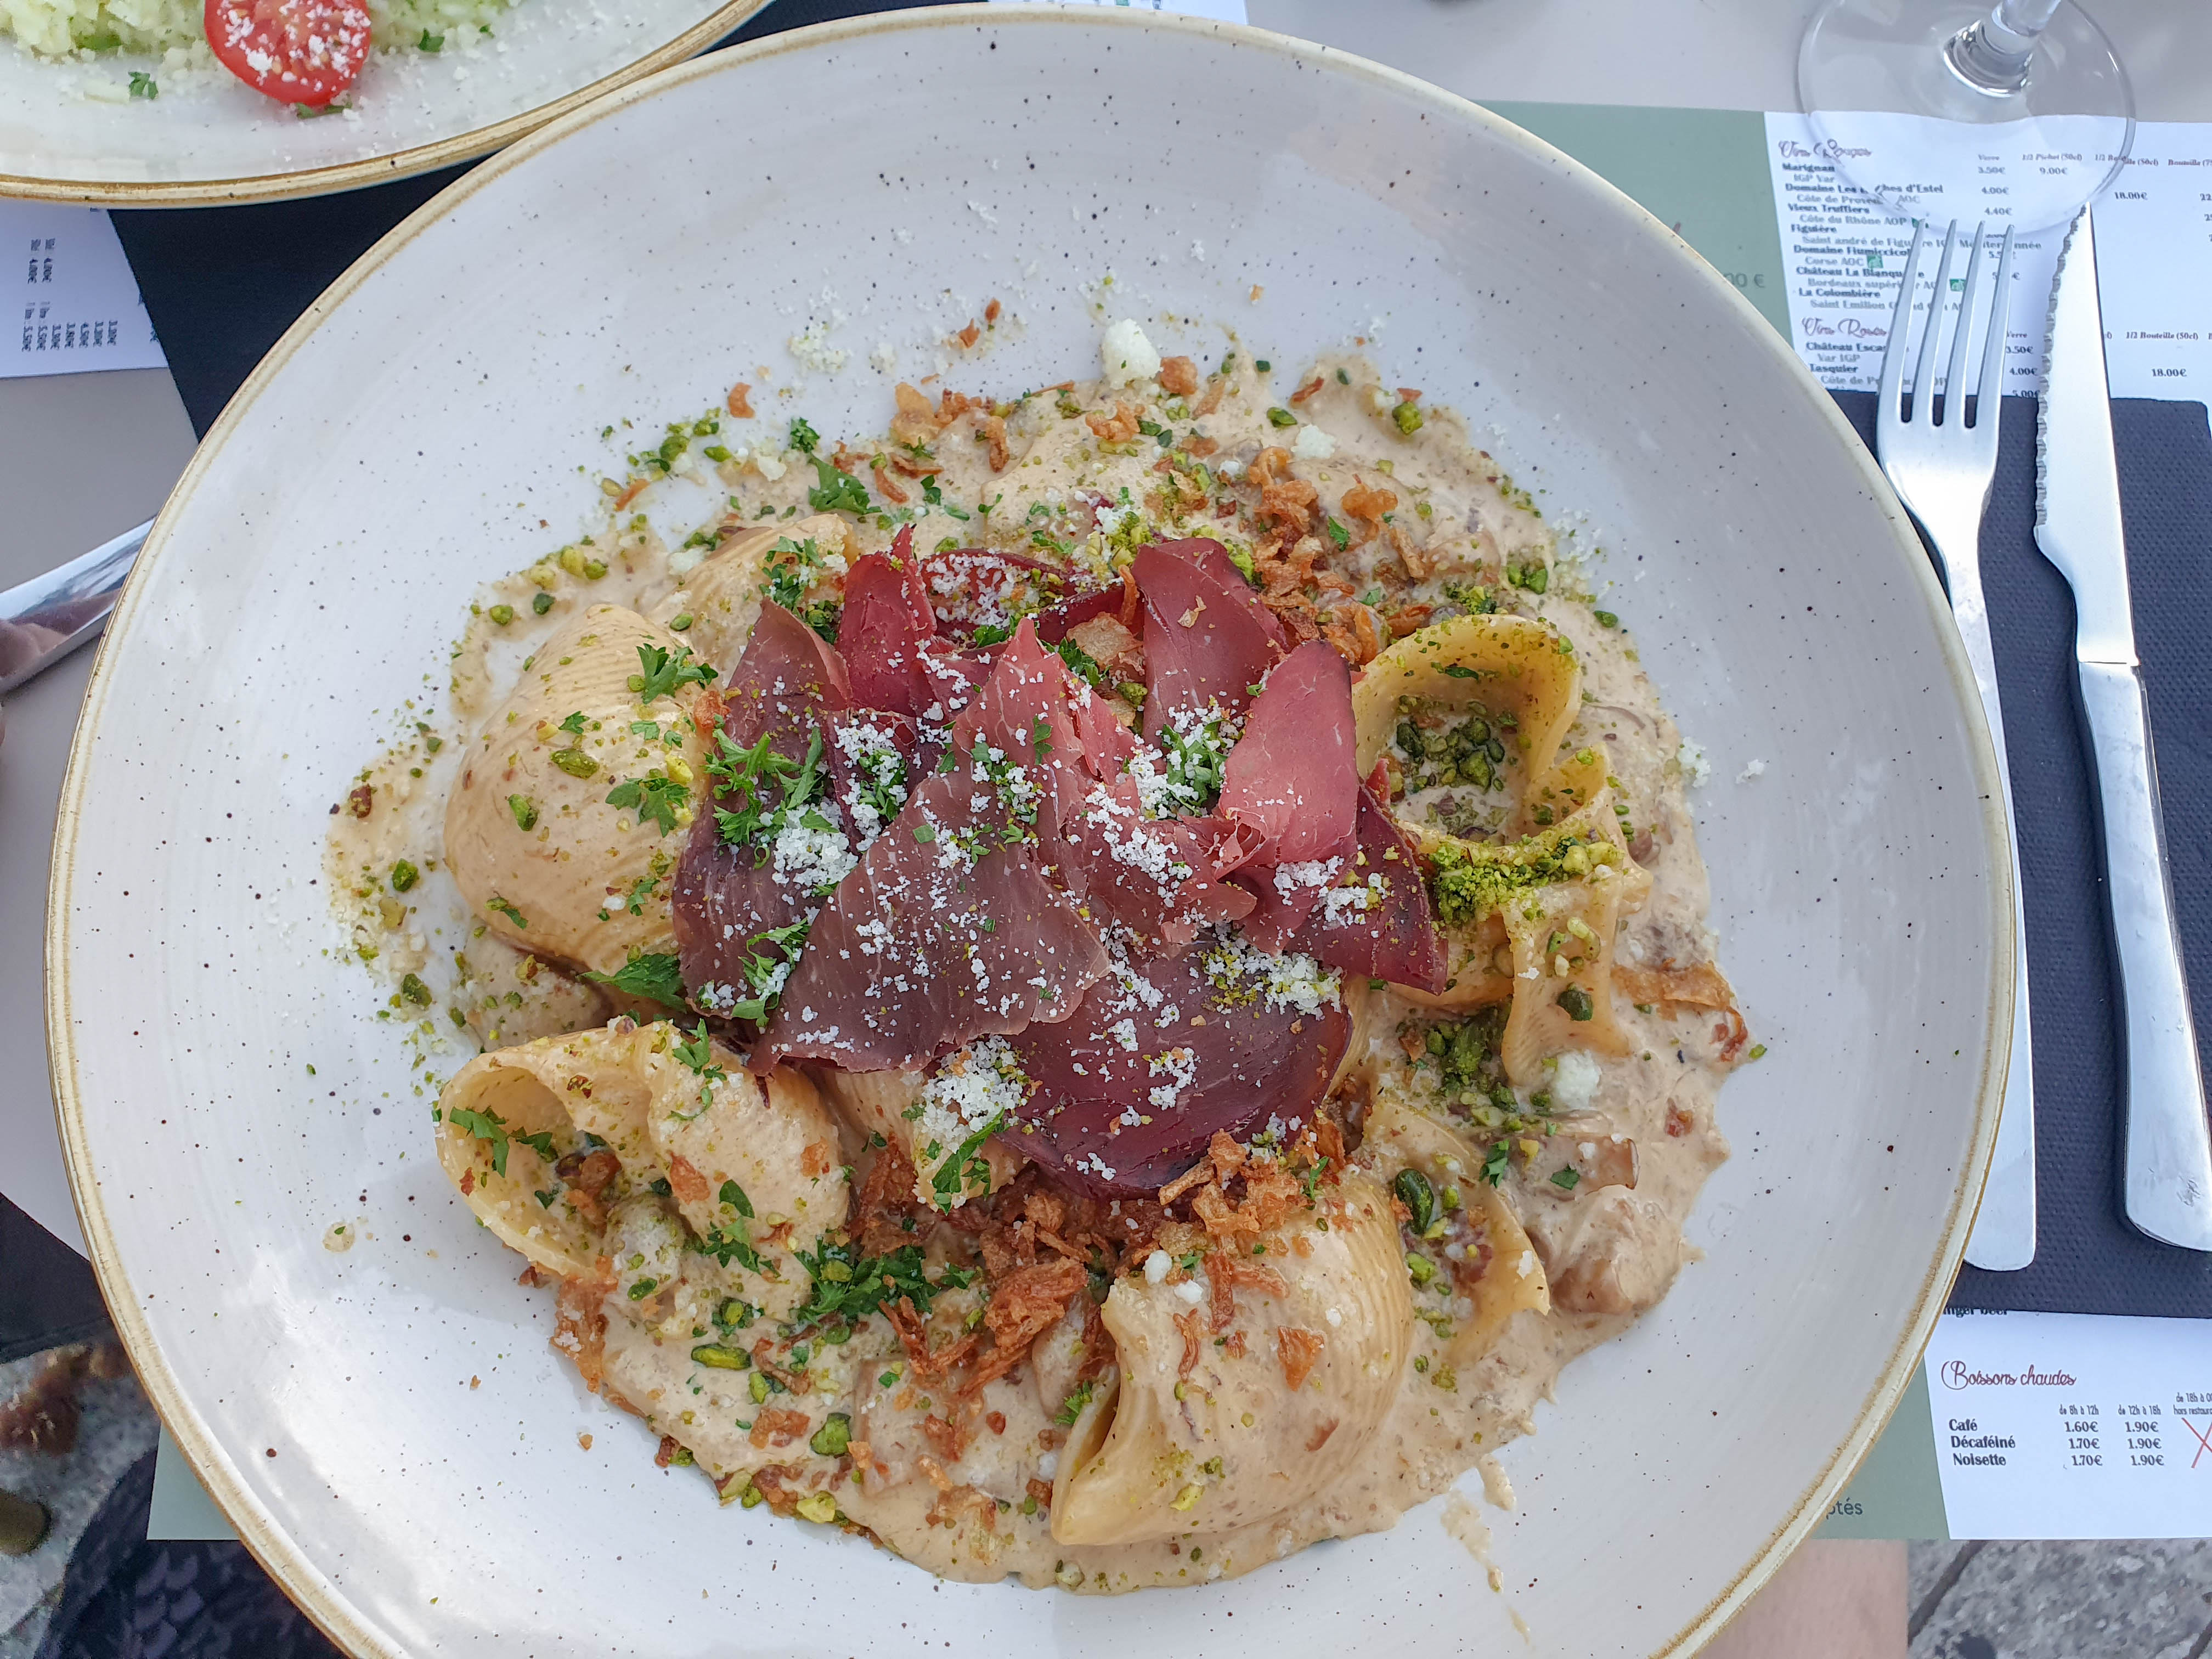 Plate of pasta at Cafe de la Place Garibaldi in Nice, France